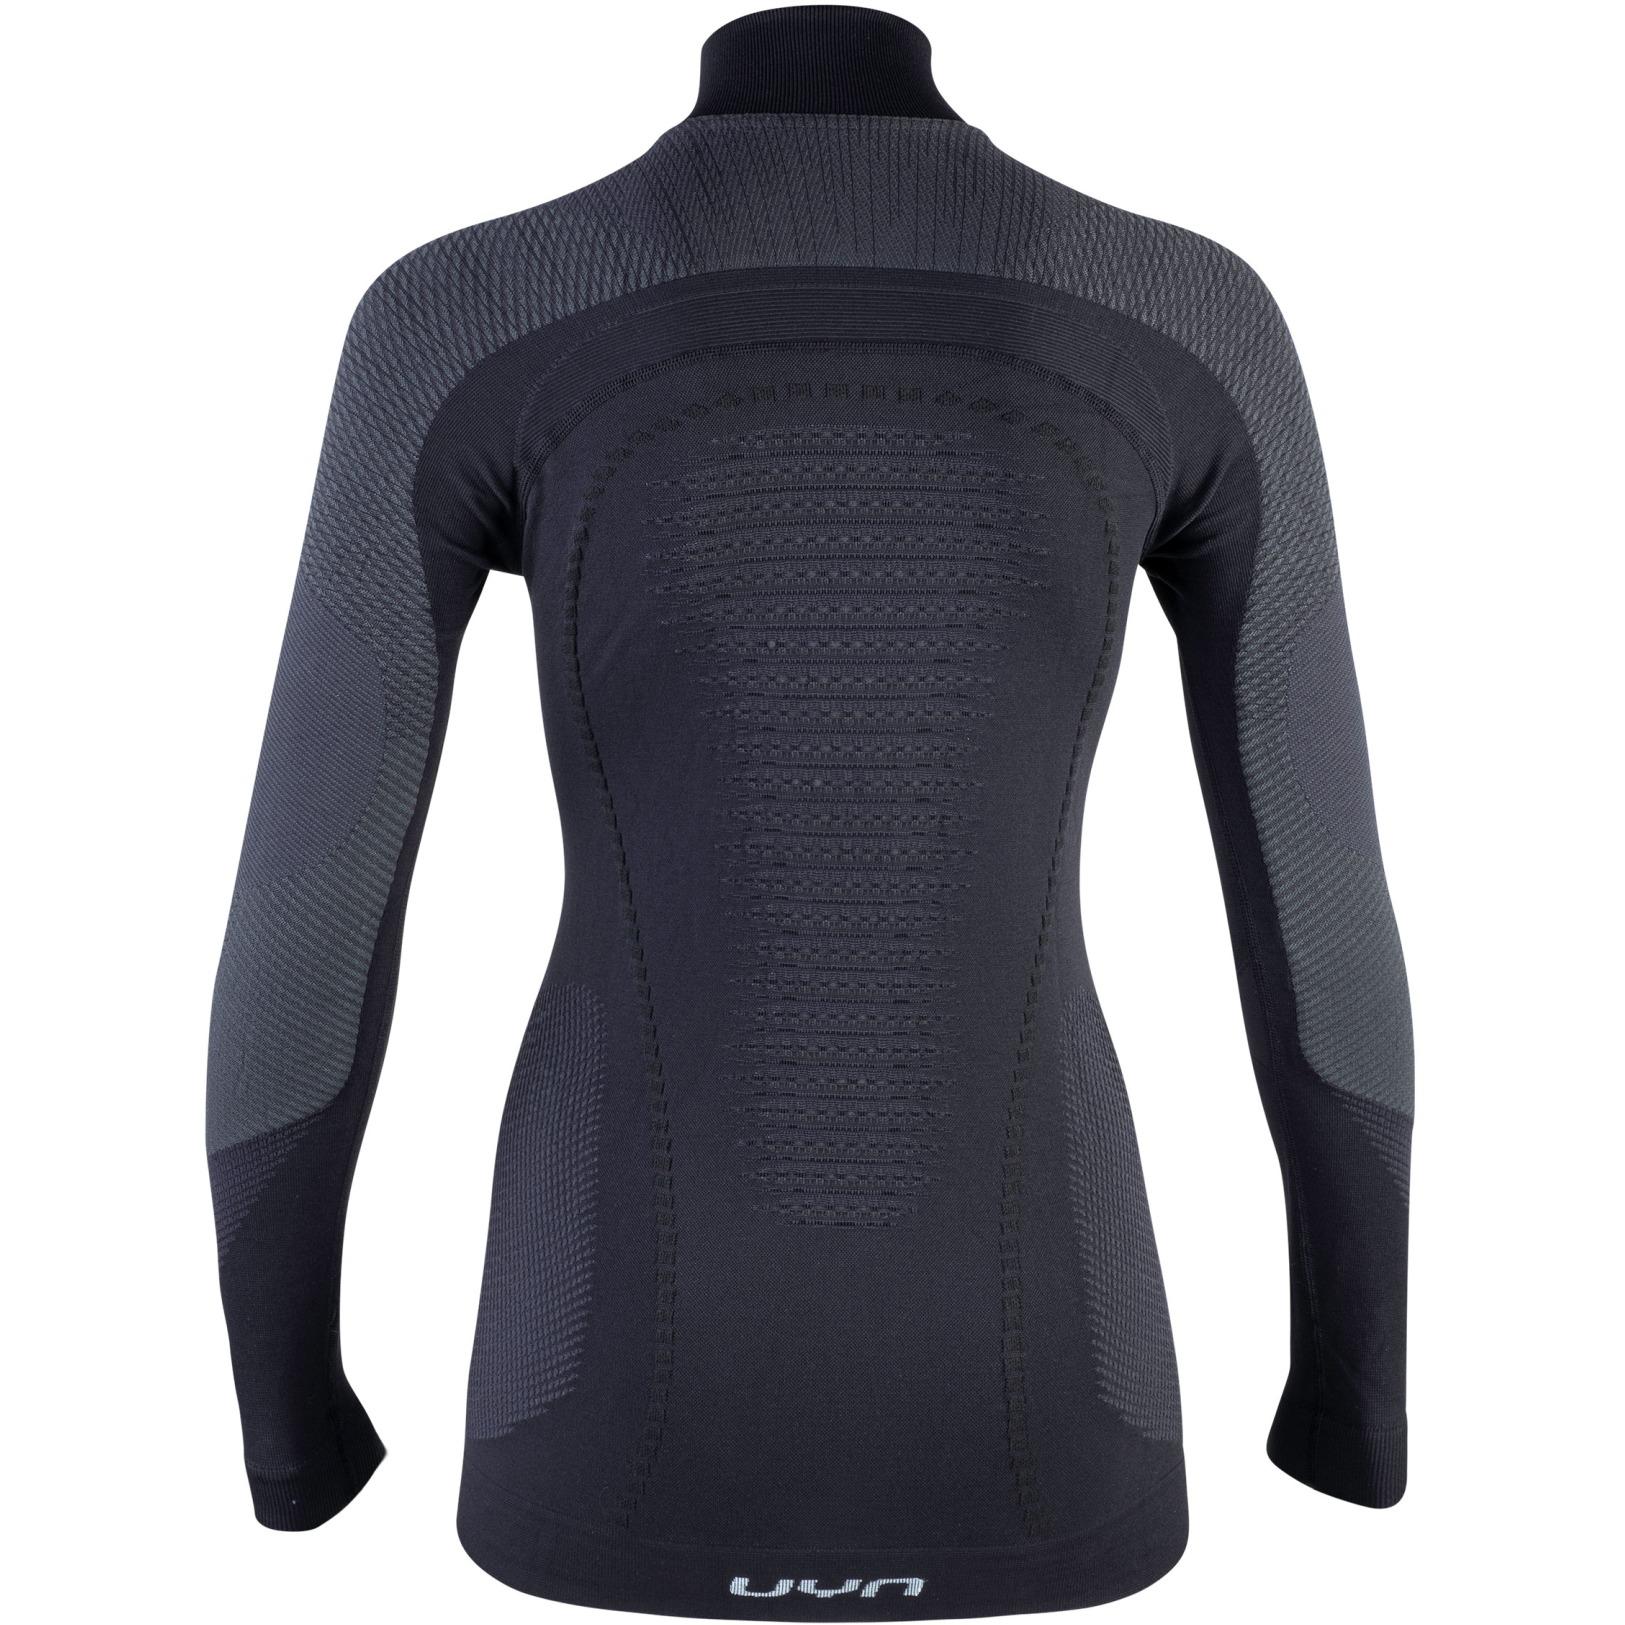 Image of UYN Ambityon Underwear Turtle Neck Shirt Women - Blackboard/Anthracite/White